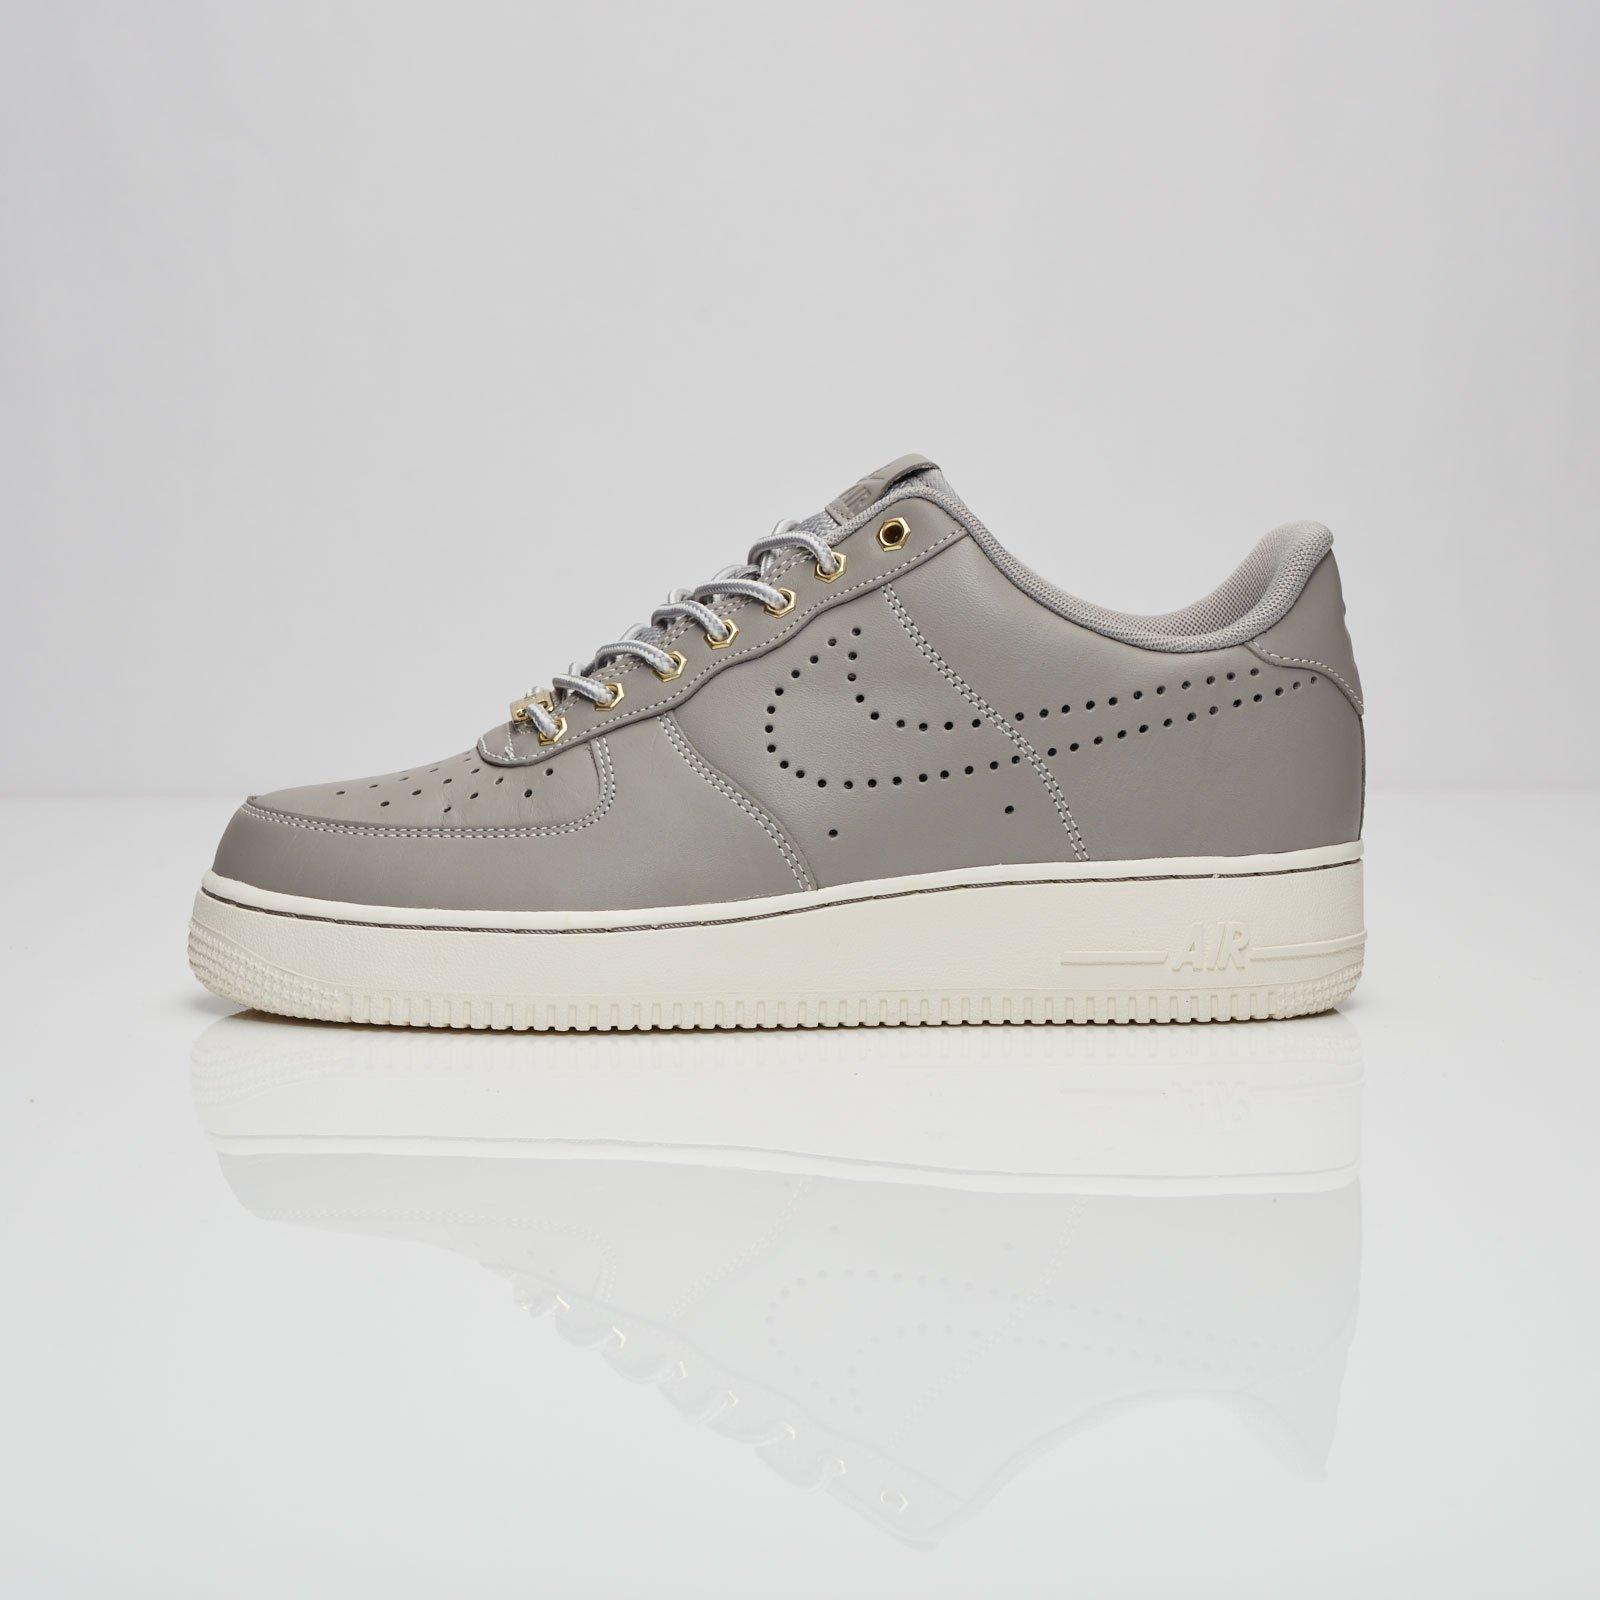 Nike Air Force 1 08 Lv8 WB 882095 002 Sneakersnstuff I